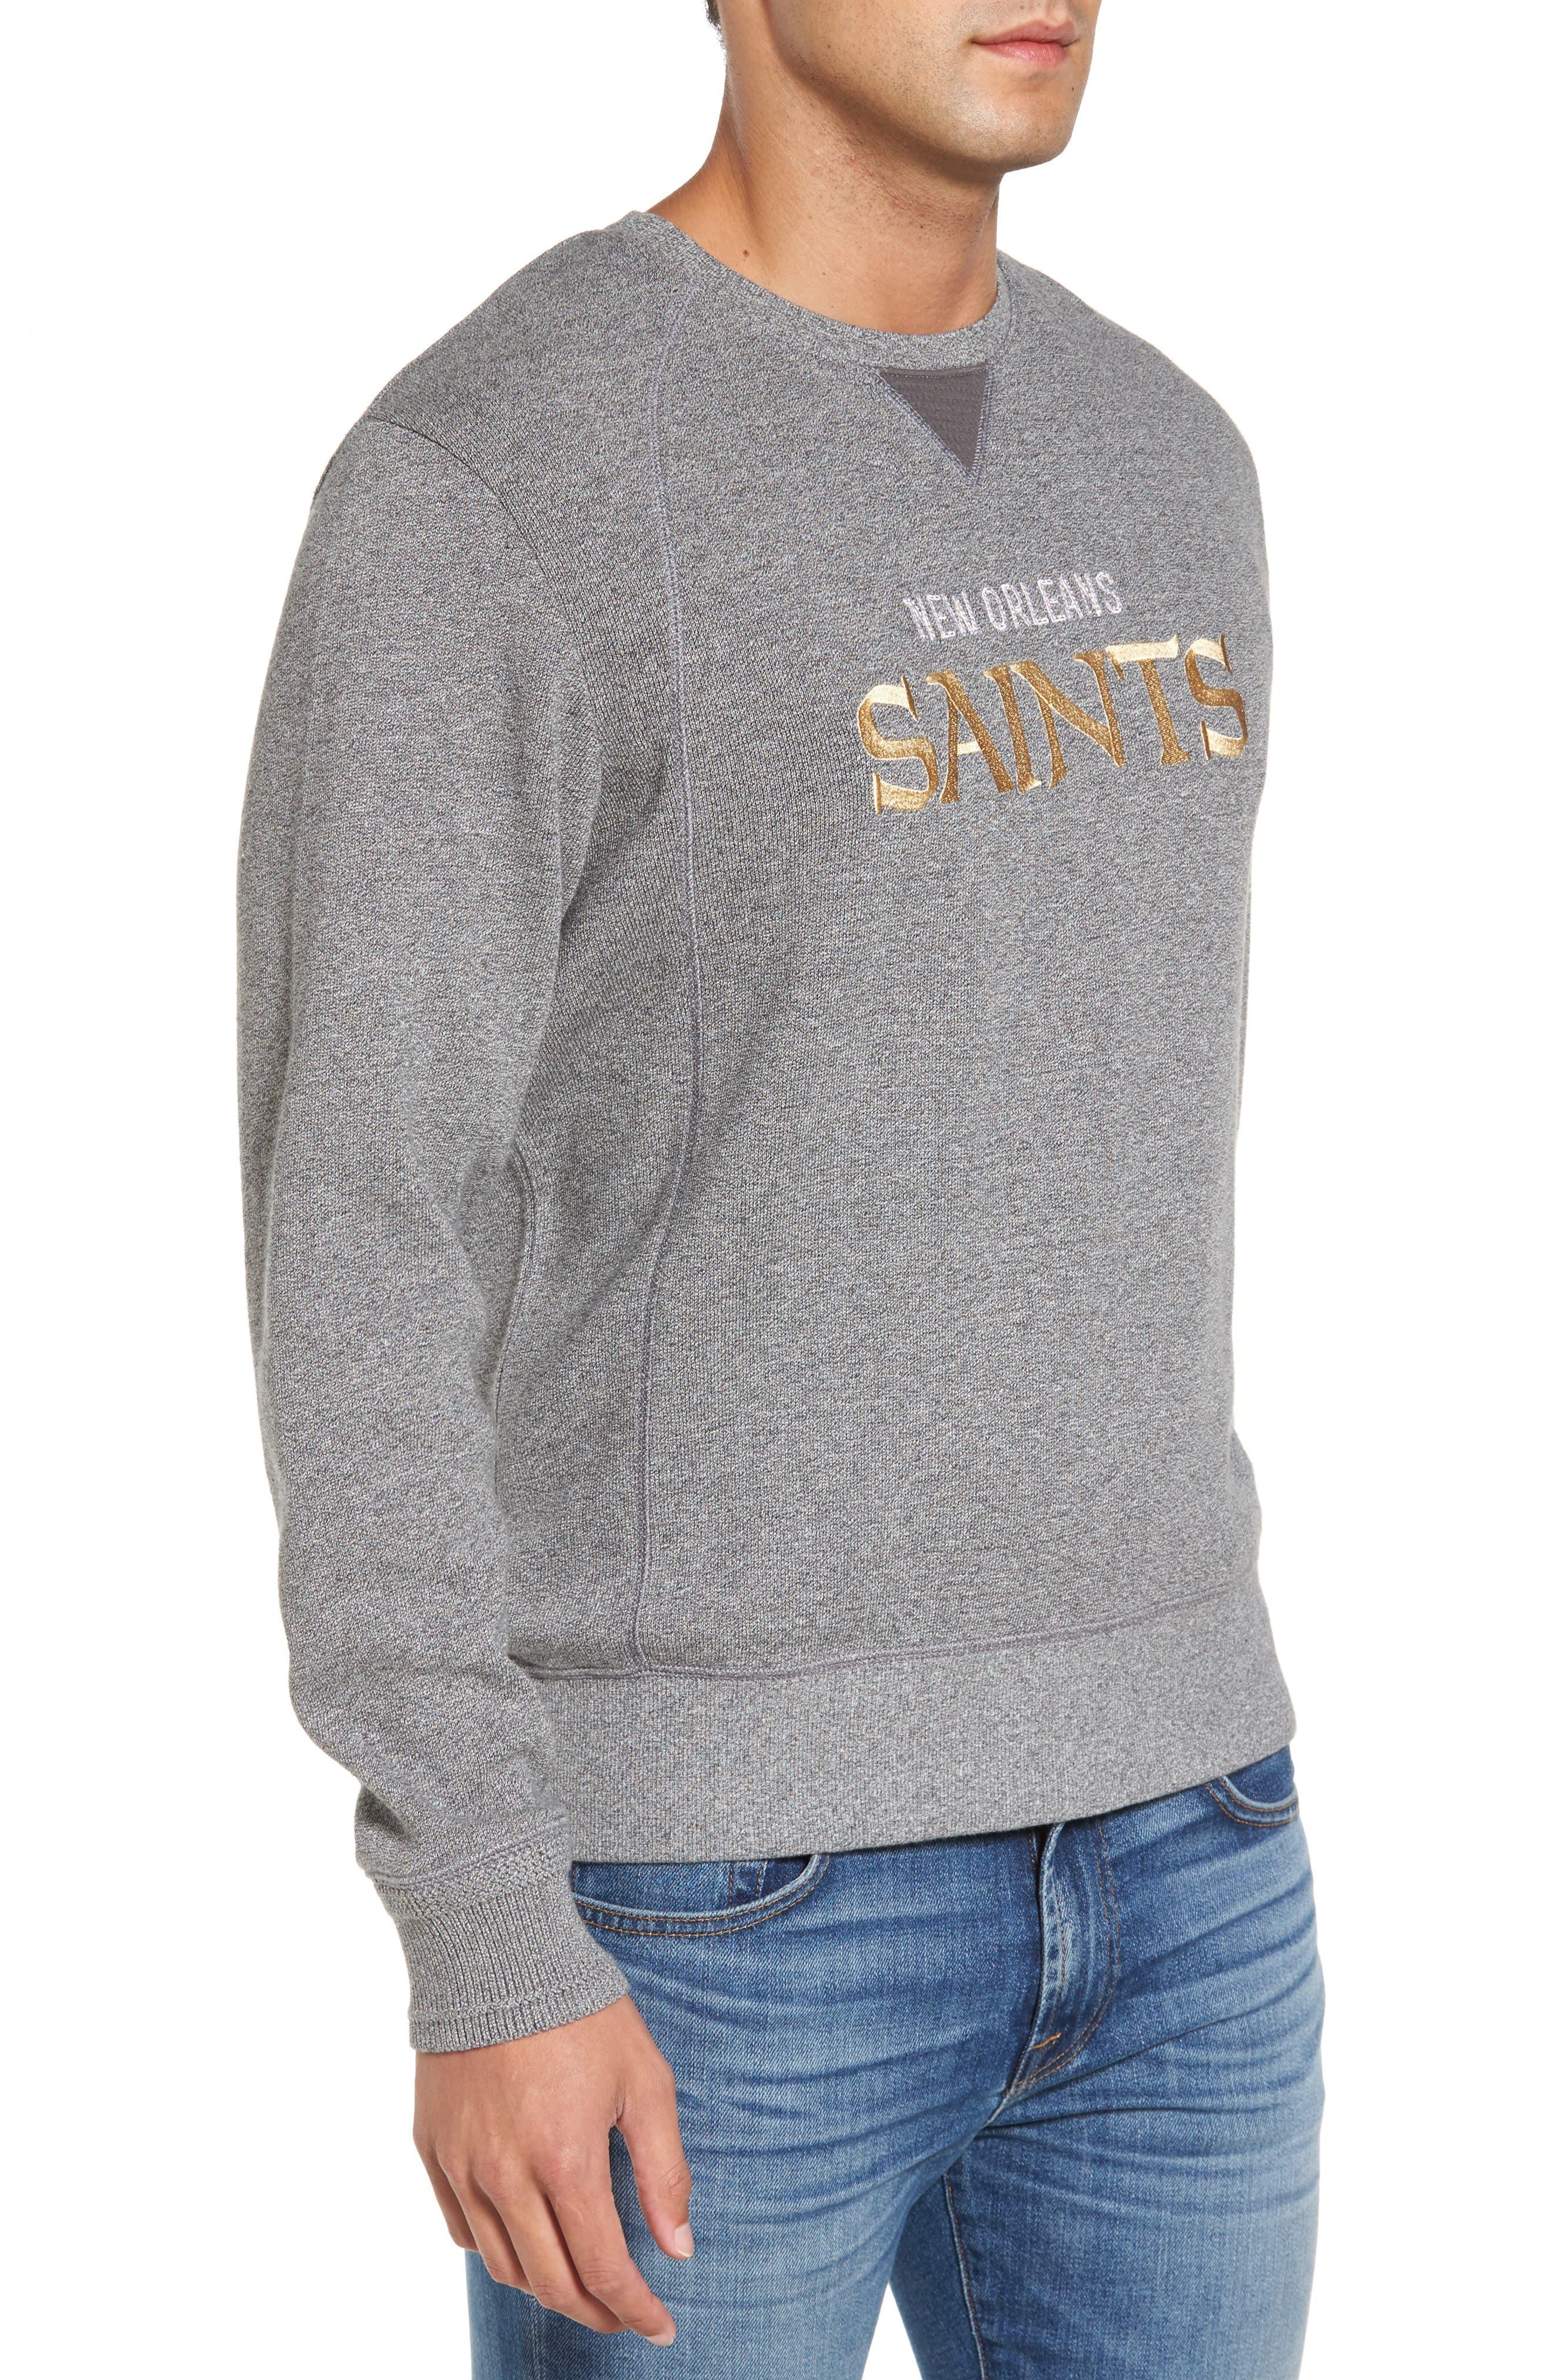 NFL Stitch of Liberty Embroidered Crewneck Sweatshirt,                             Alternate thumbnail 87, color,